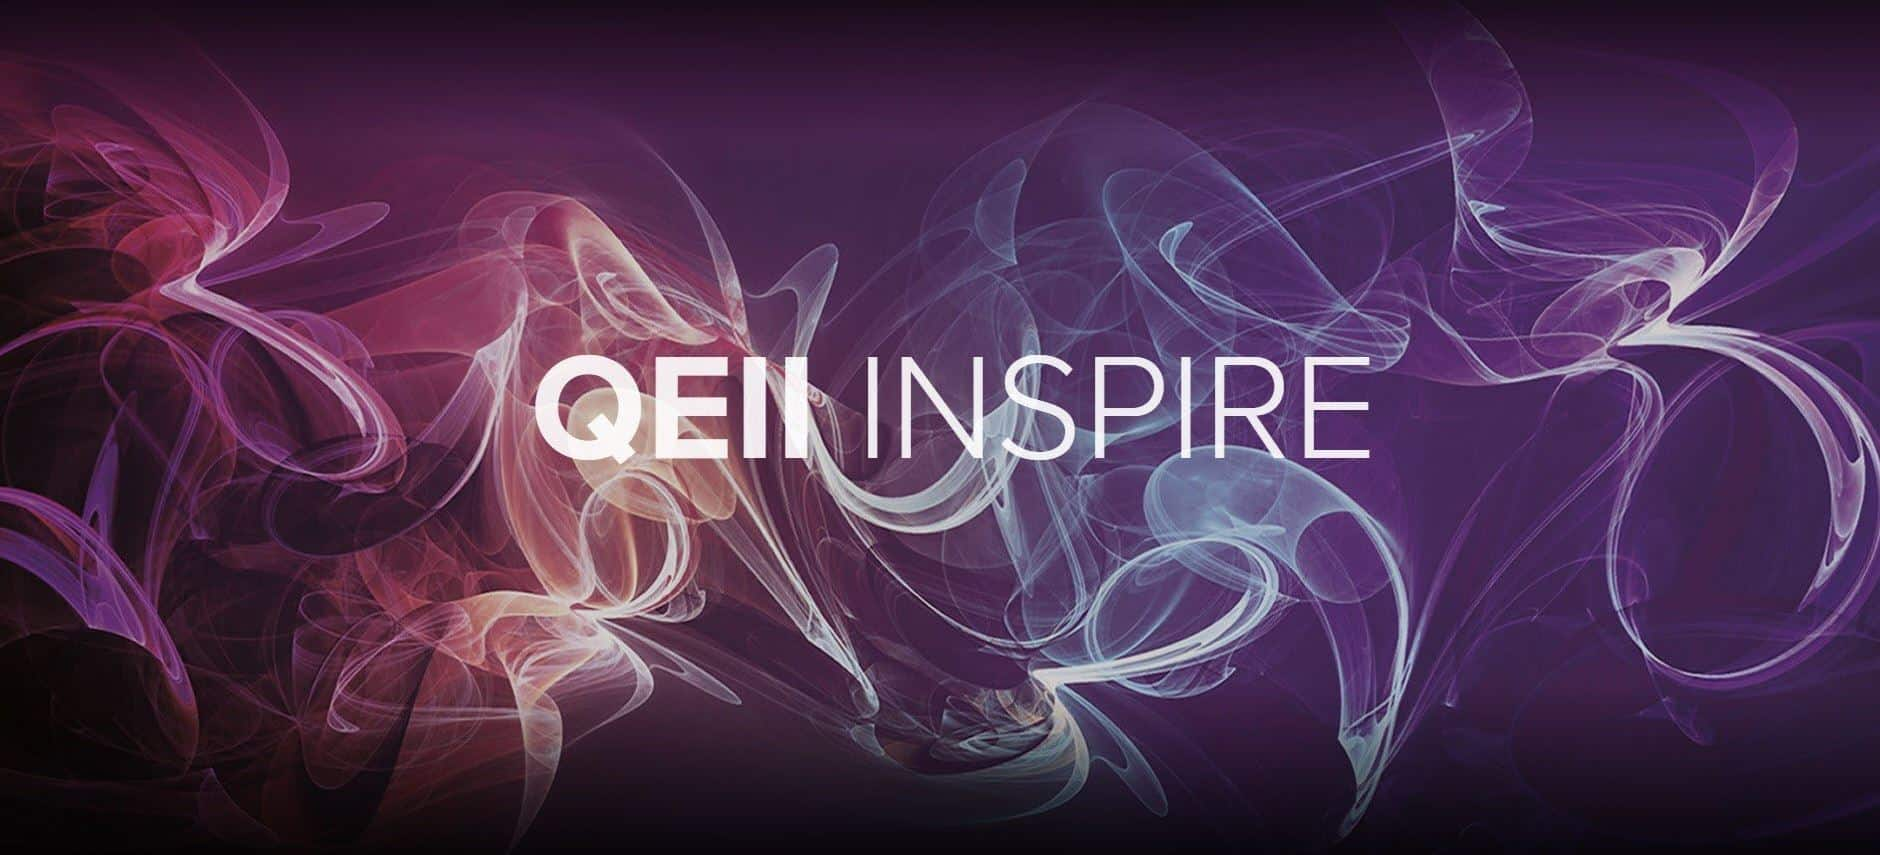 QEII Inspire